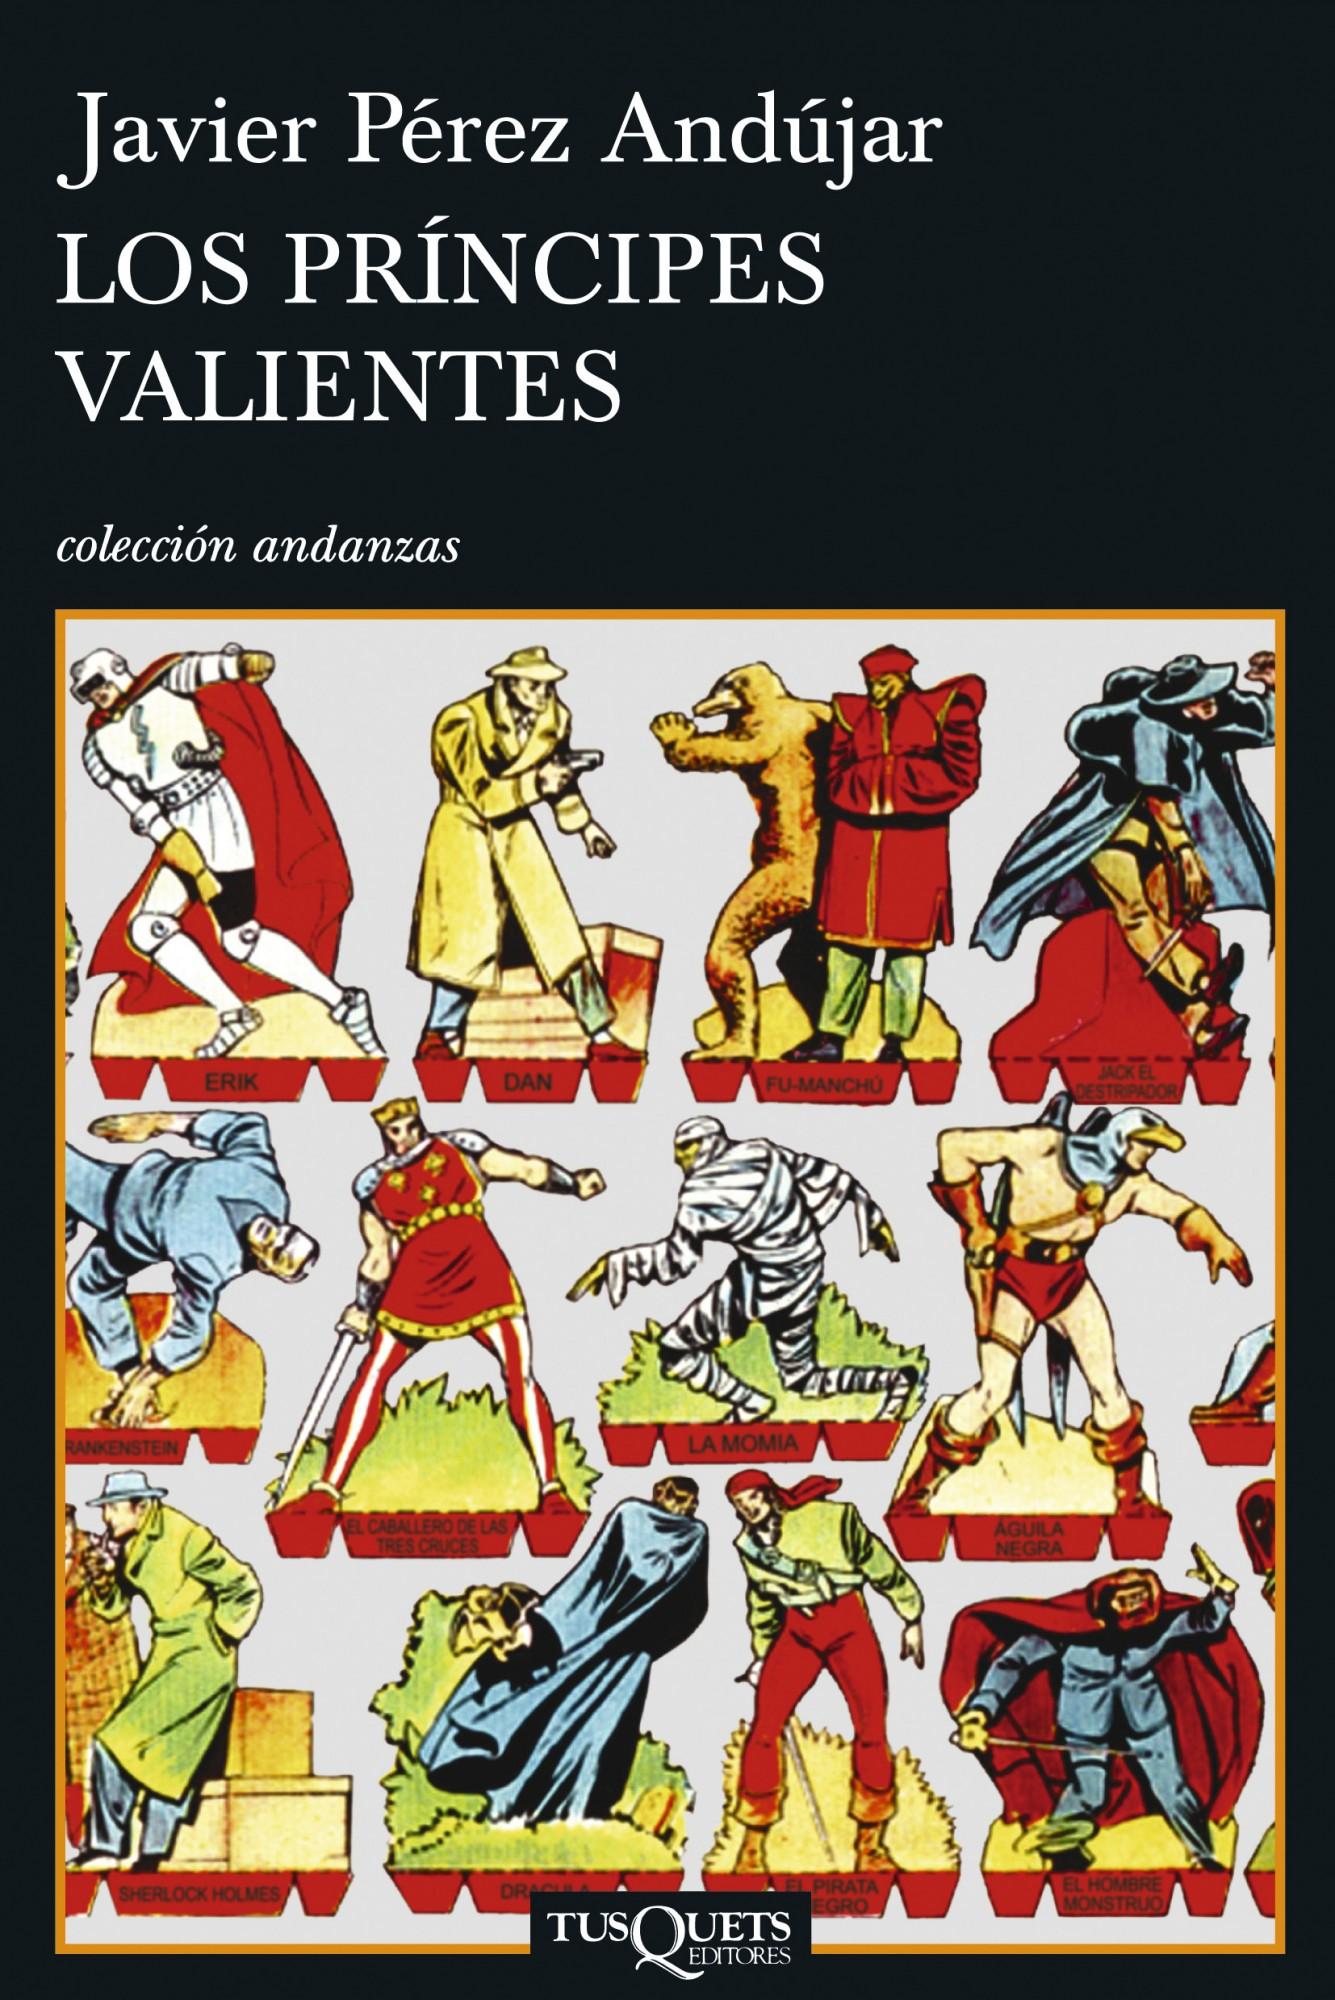 Los Principes Valientes - Perez Andujar Javier